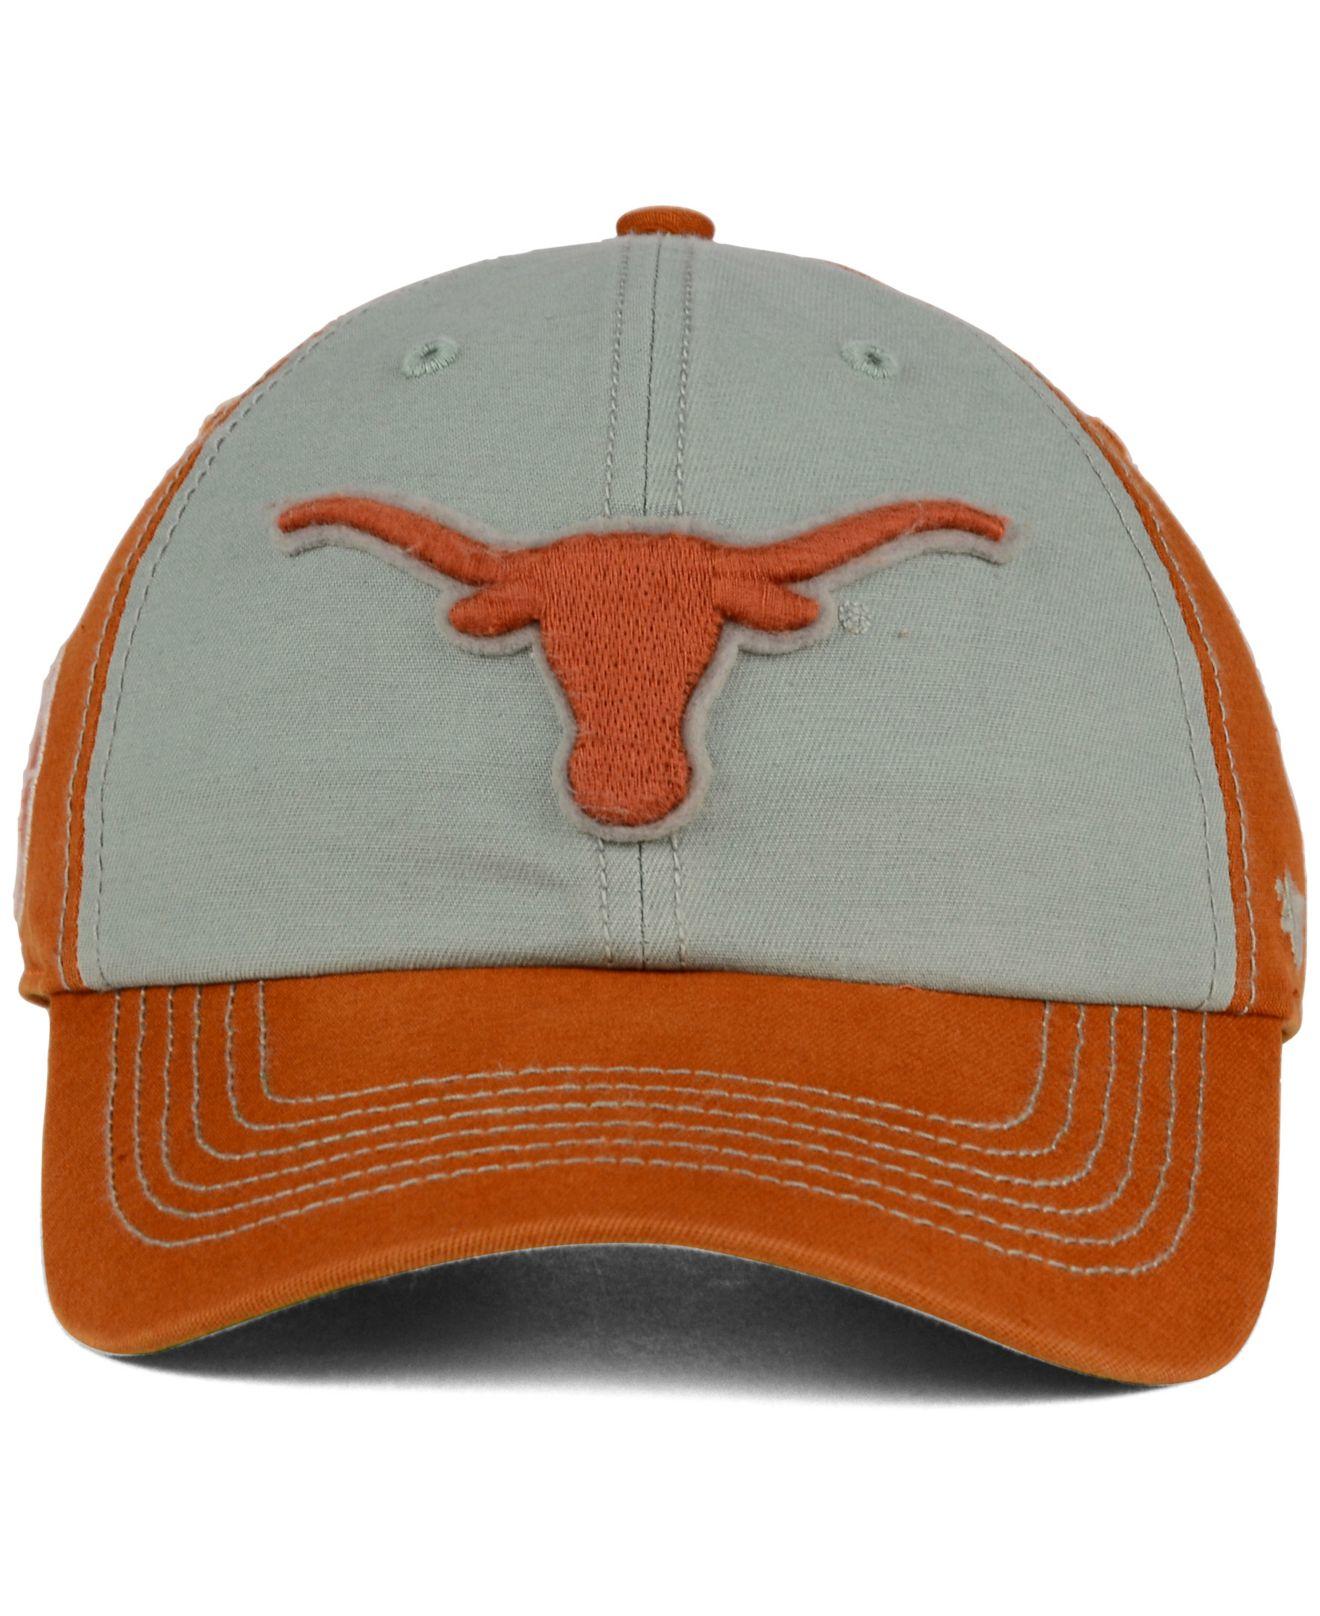 31b064ddbf4a8 Lyst - 47 Brand Texas Longhorns Mcgraw Clean Up Cap in Orange for Men